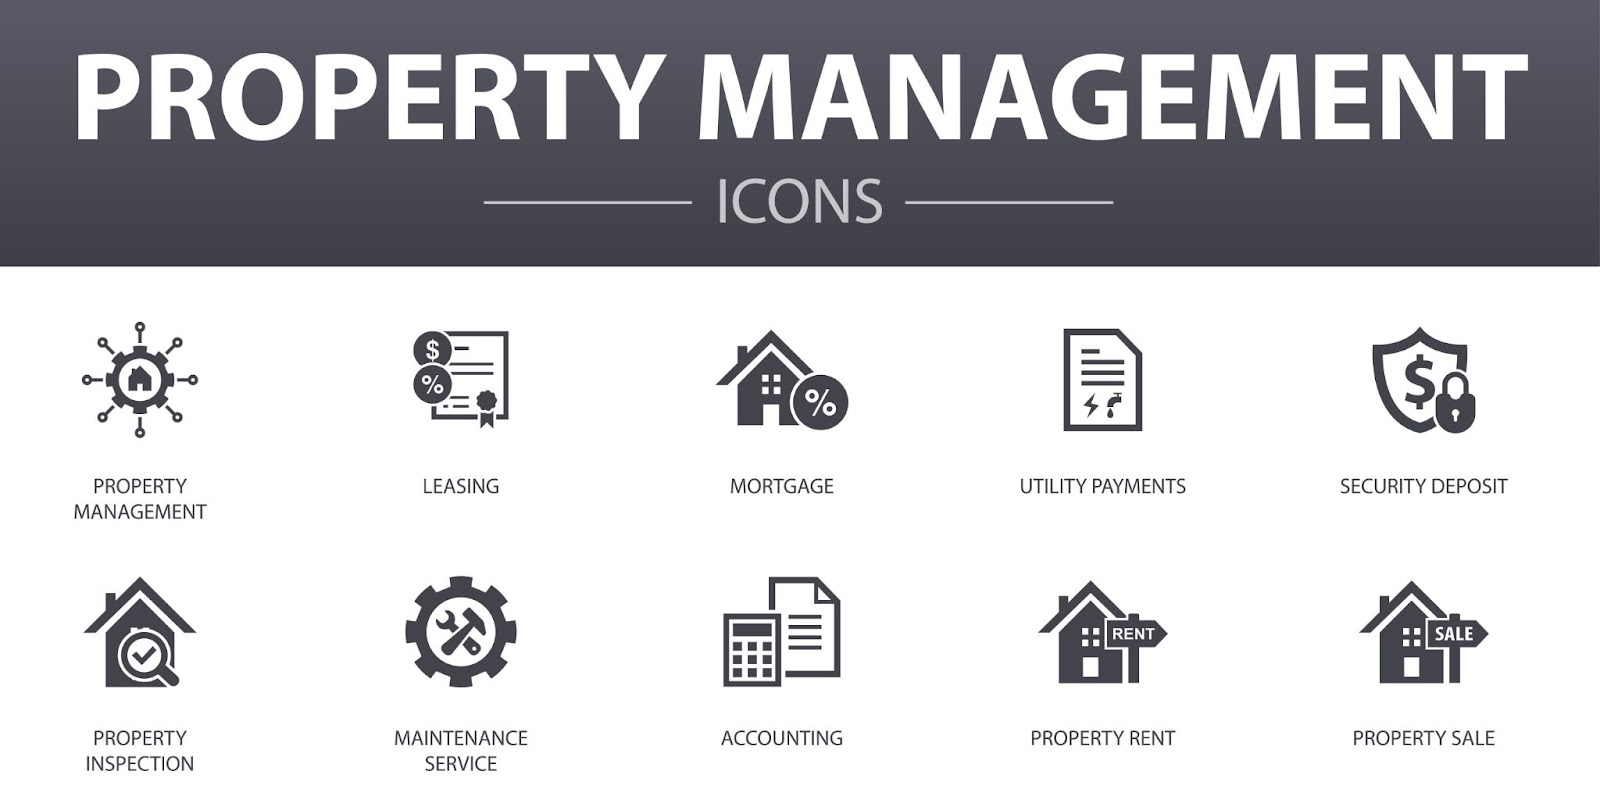 Property Management Icons